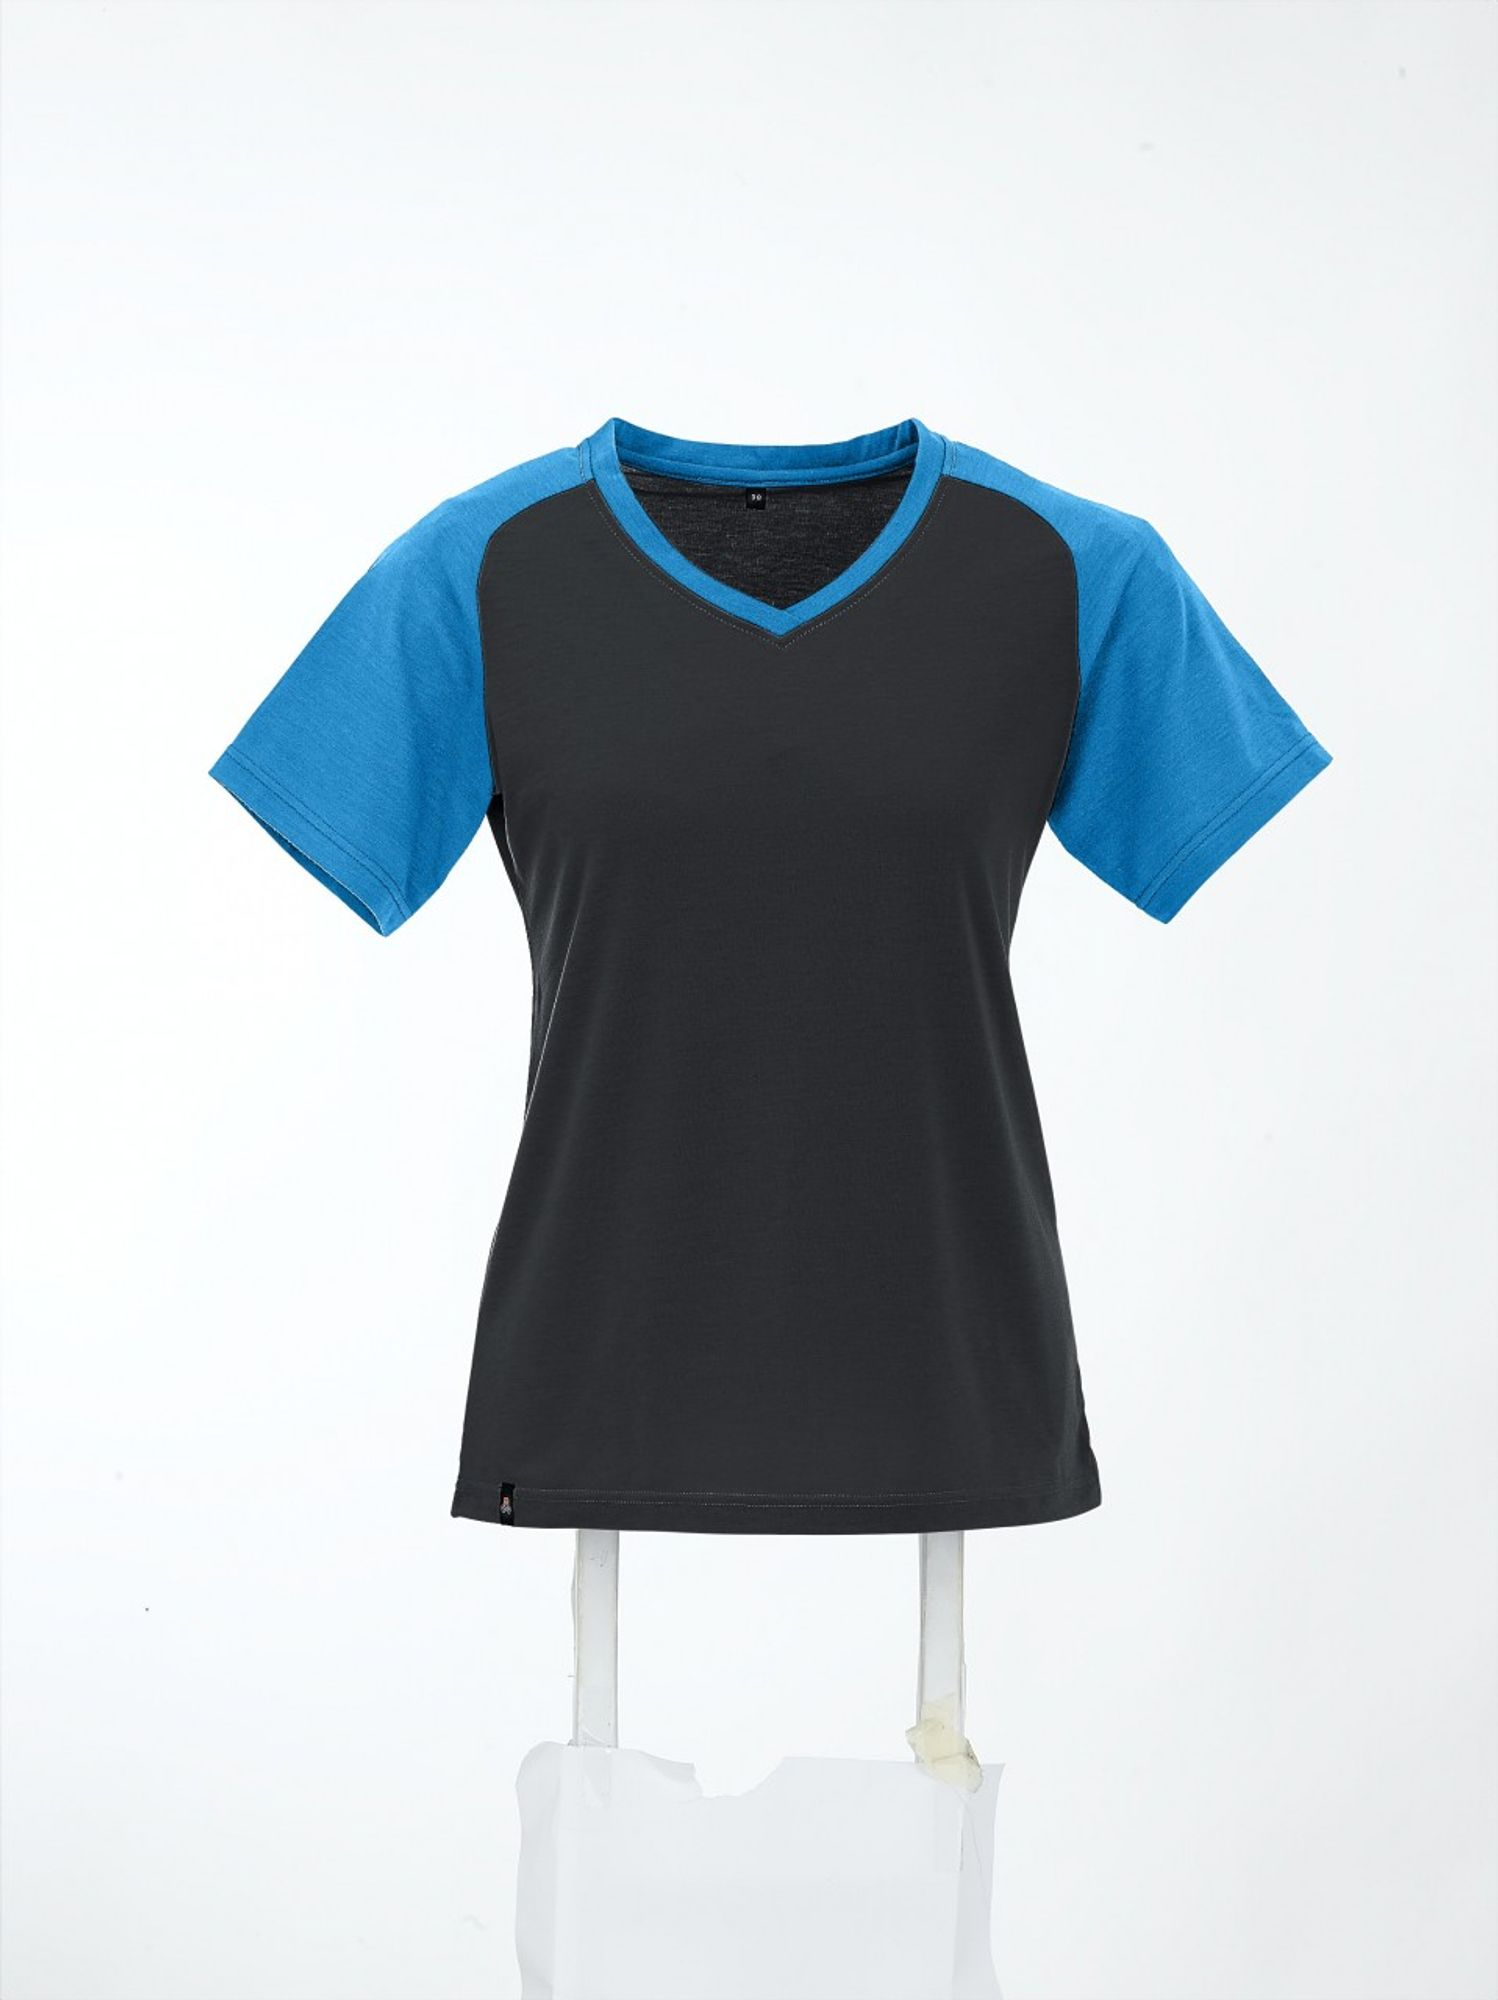 Maul Falzkoepfl Funktions-T-Shirt+Pr - black/sky blue